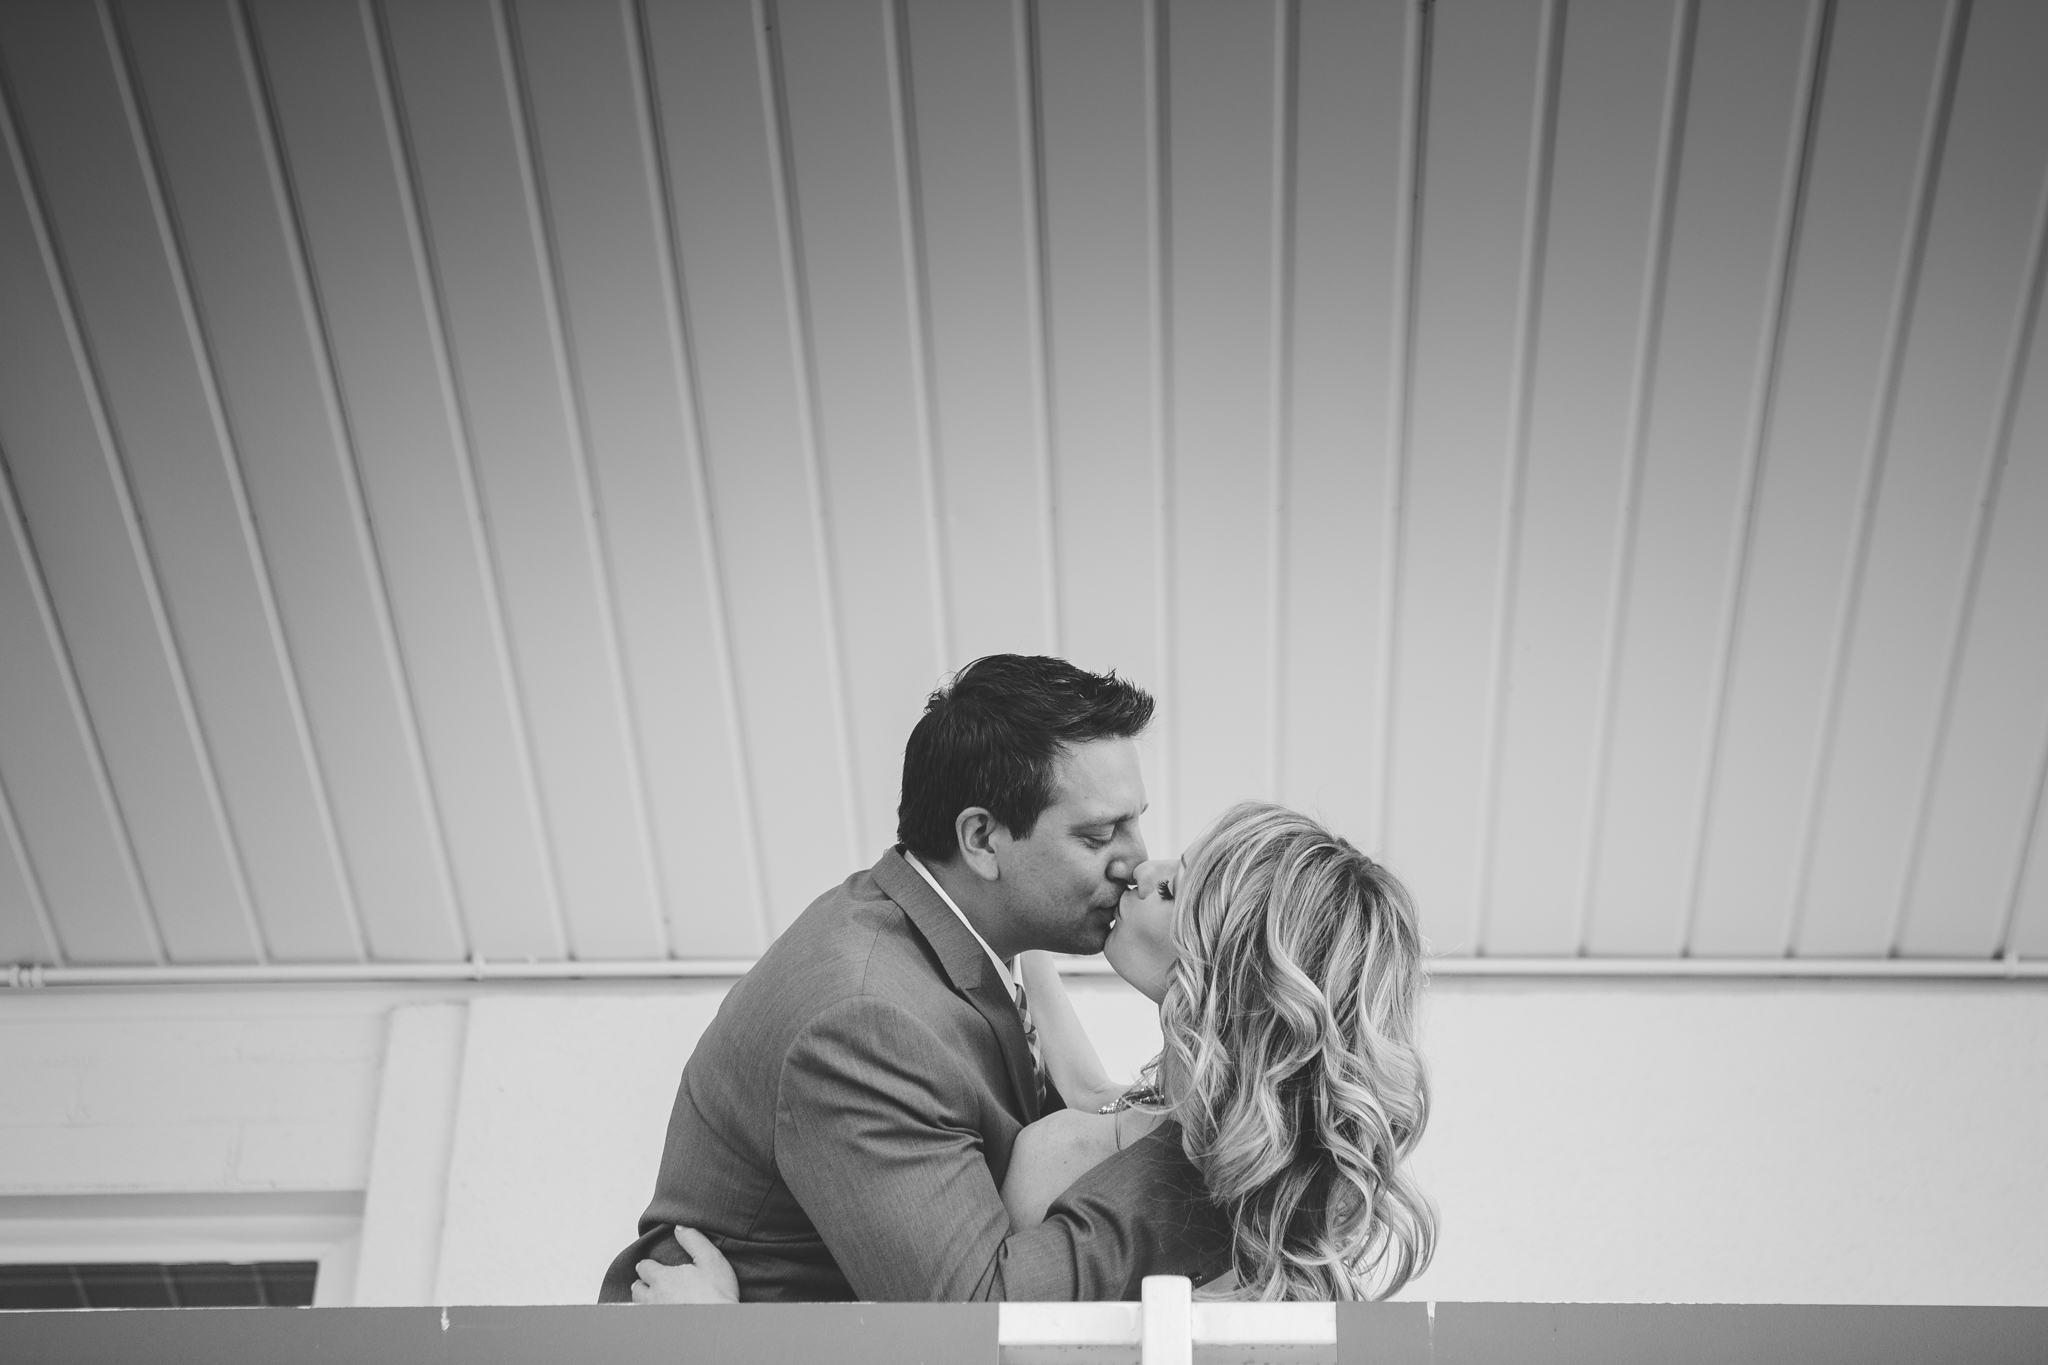 scottsdale-wedding-photographer-el-dorado-black-and-white-bride-groom-kiss